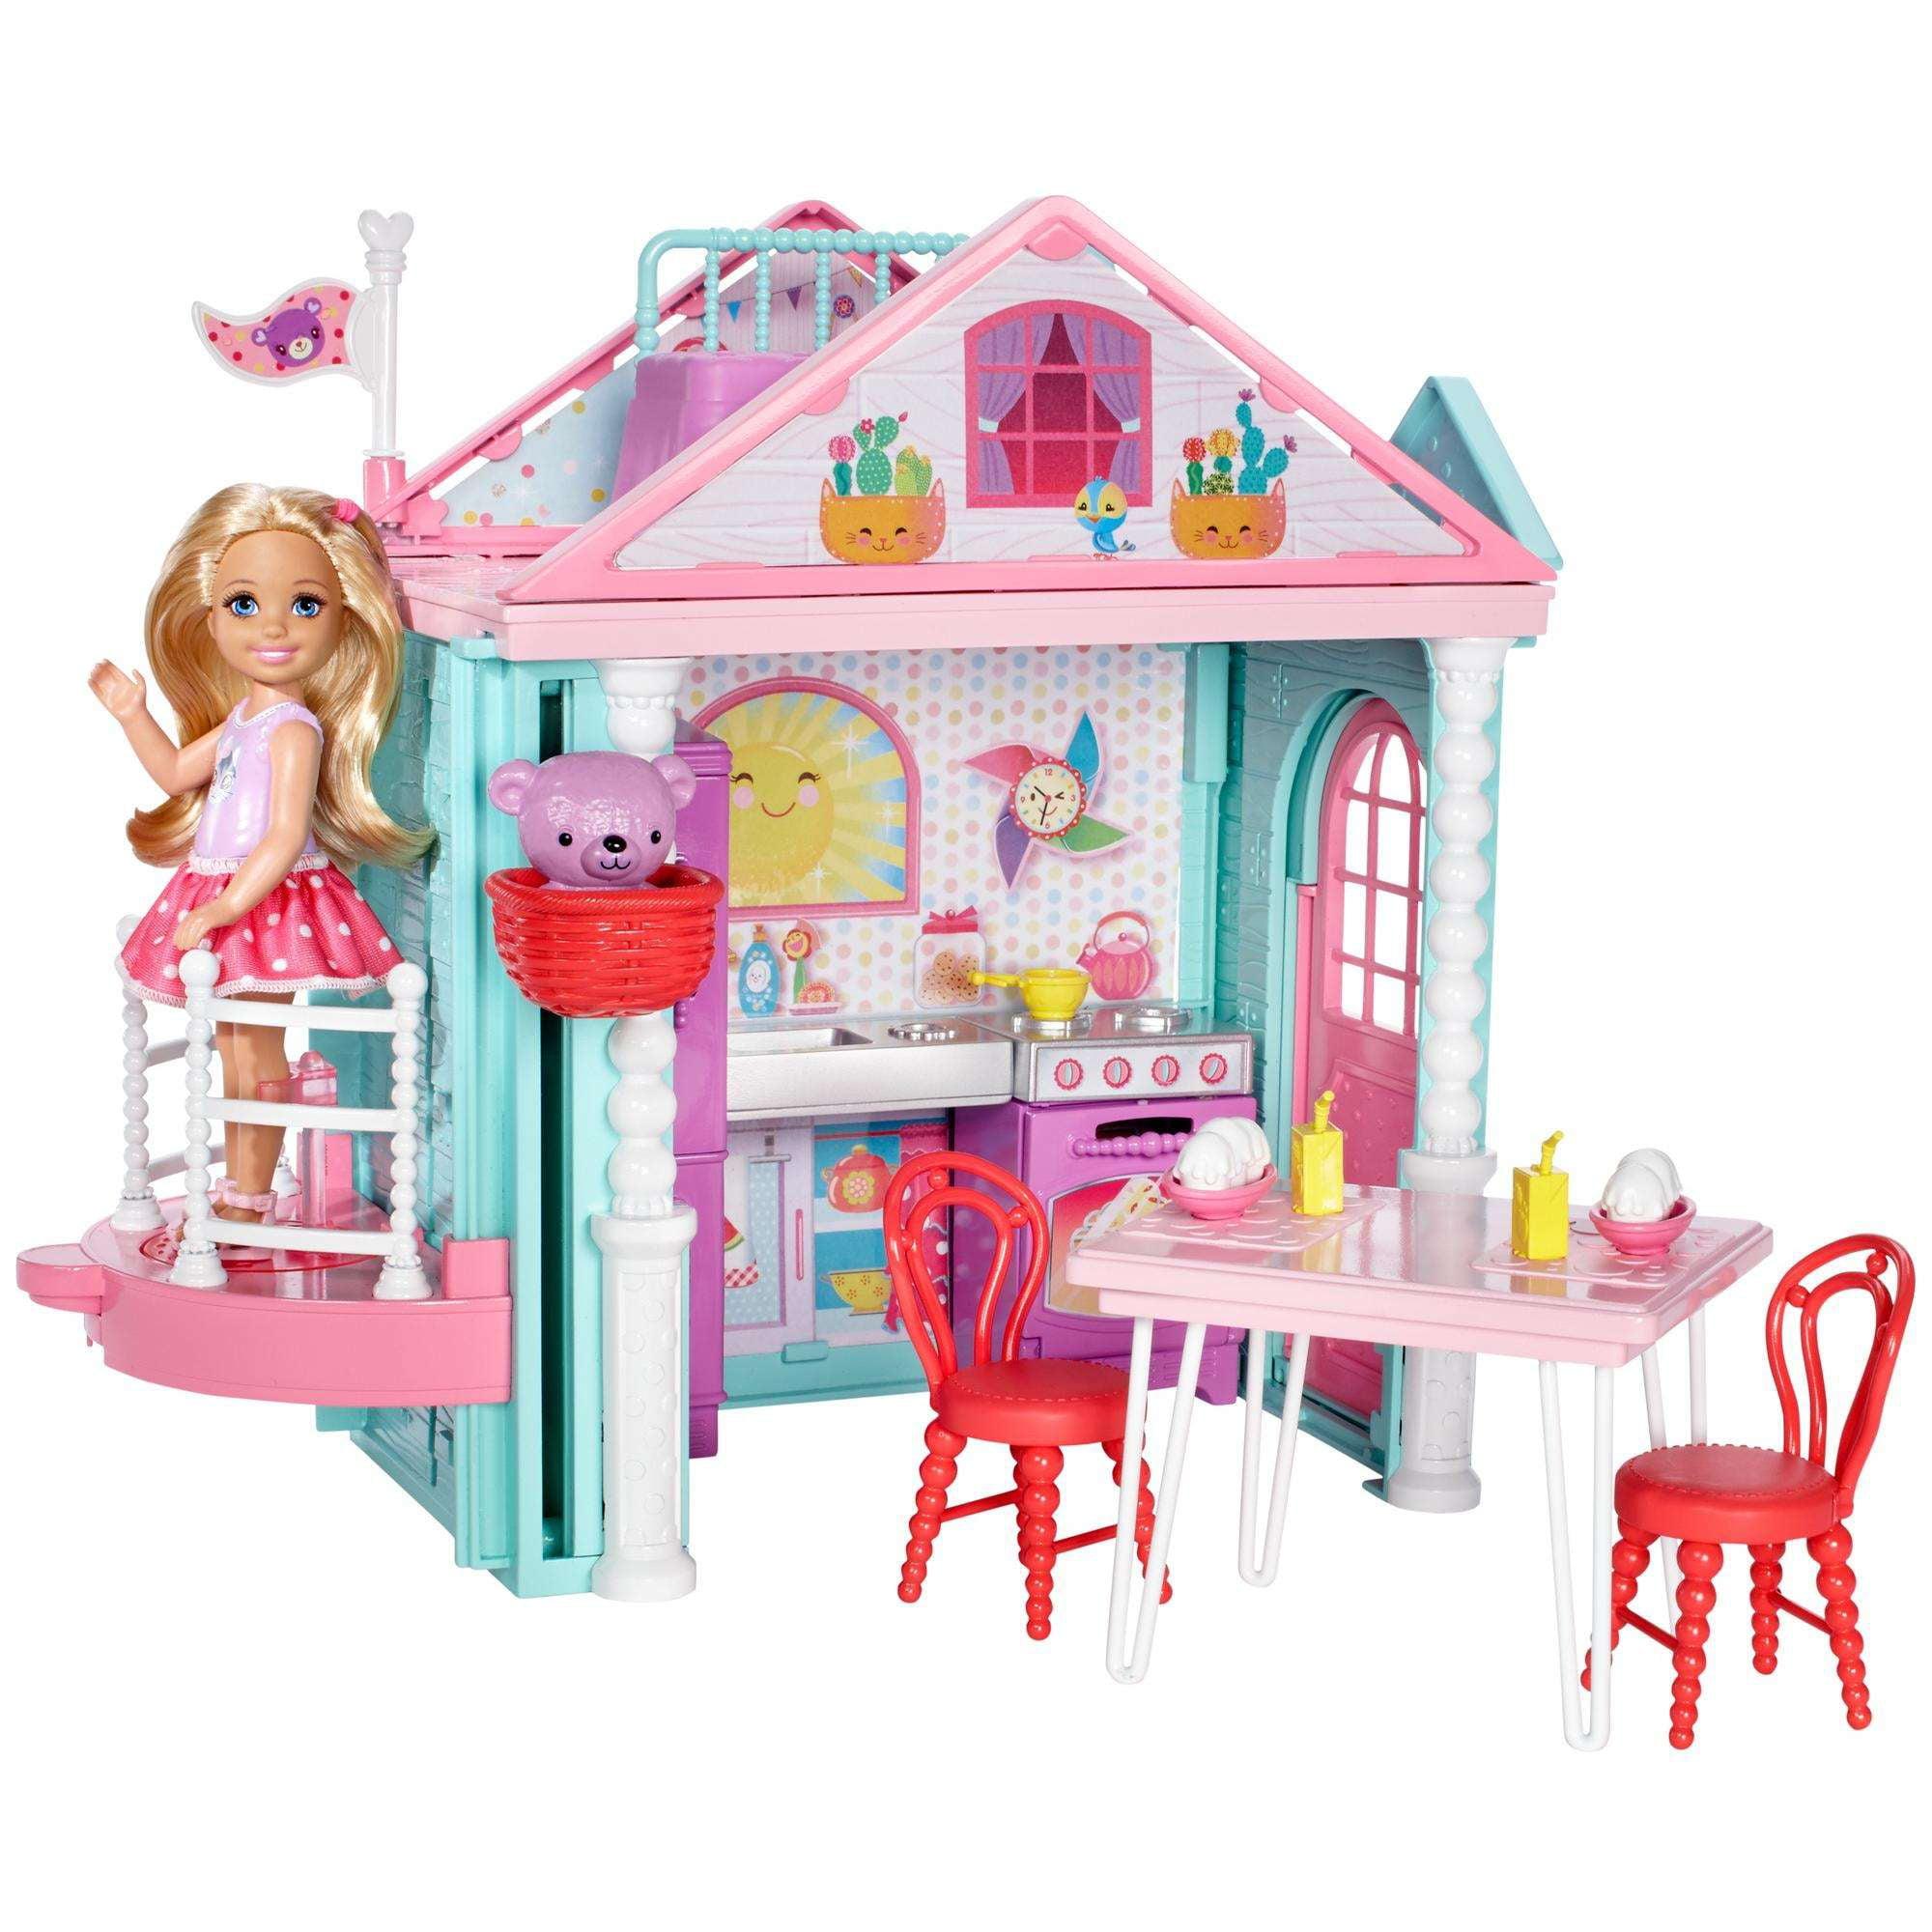 Barbie Club Chelsea Playhouse by Mattel